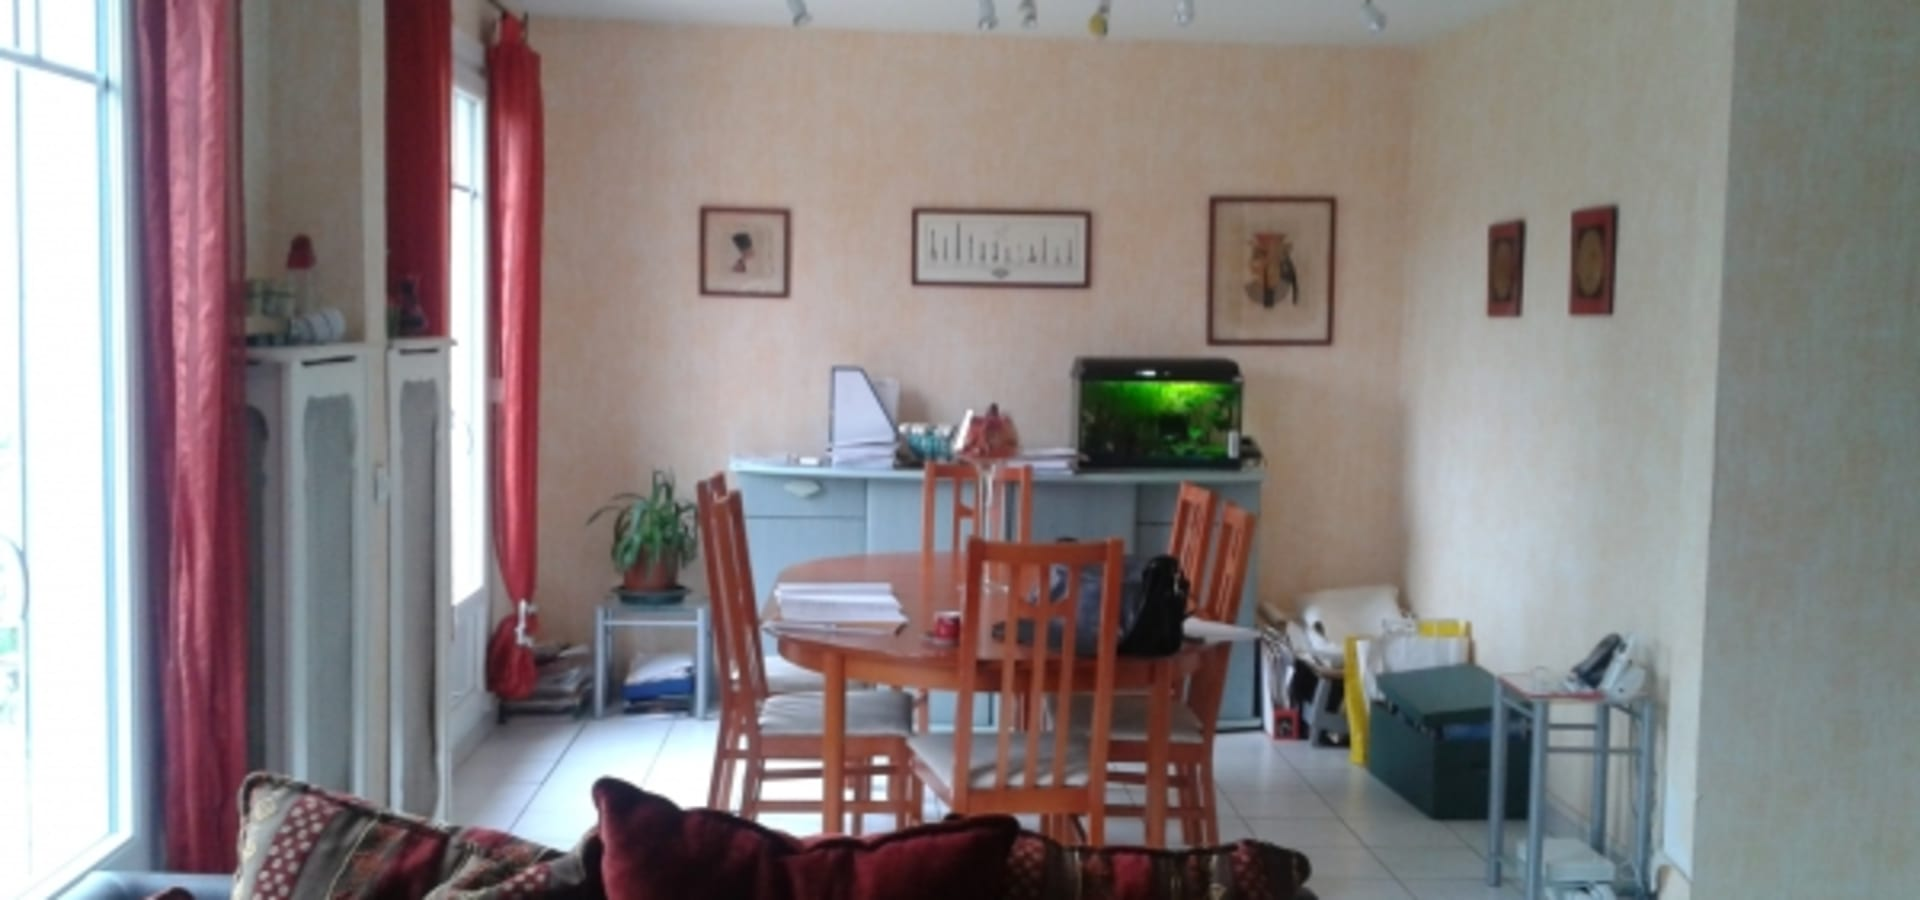 renovation maison wattrelos